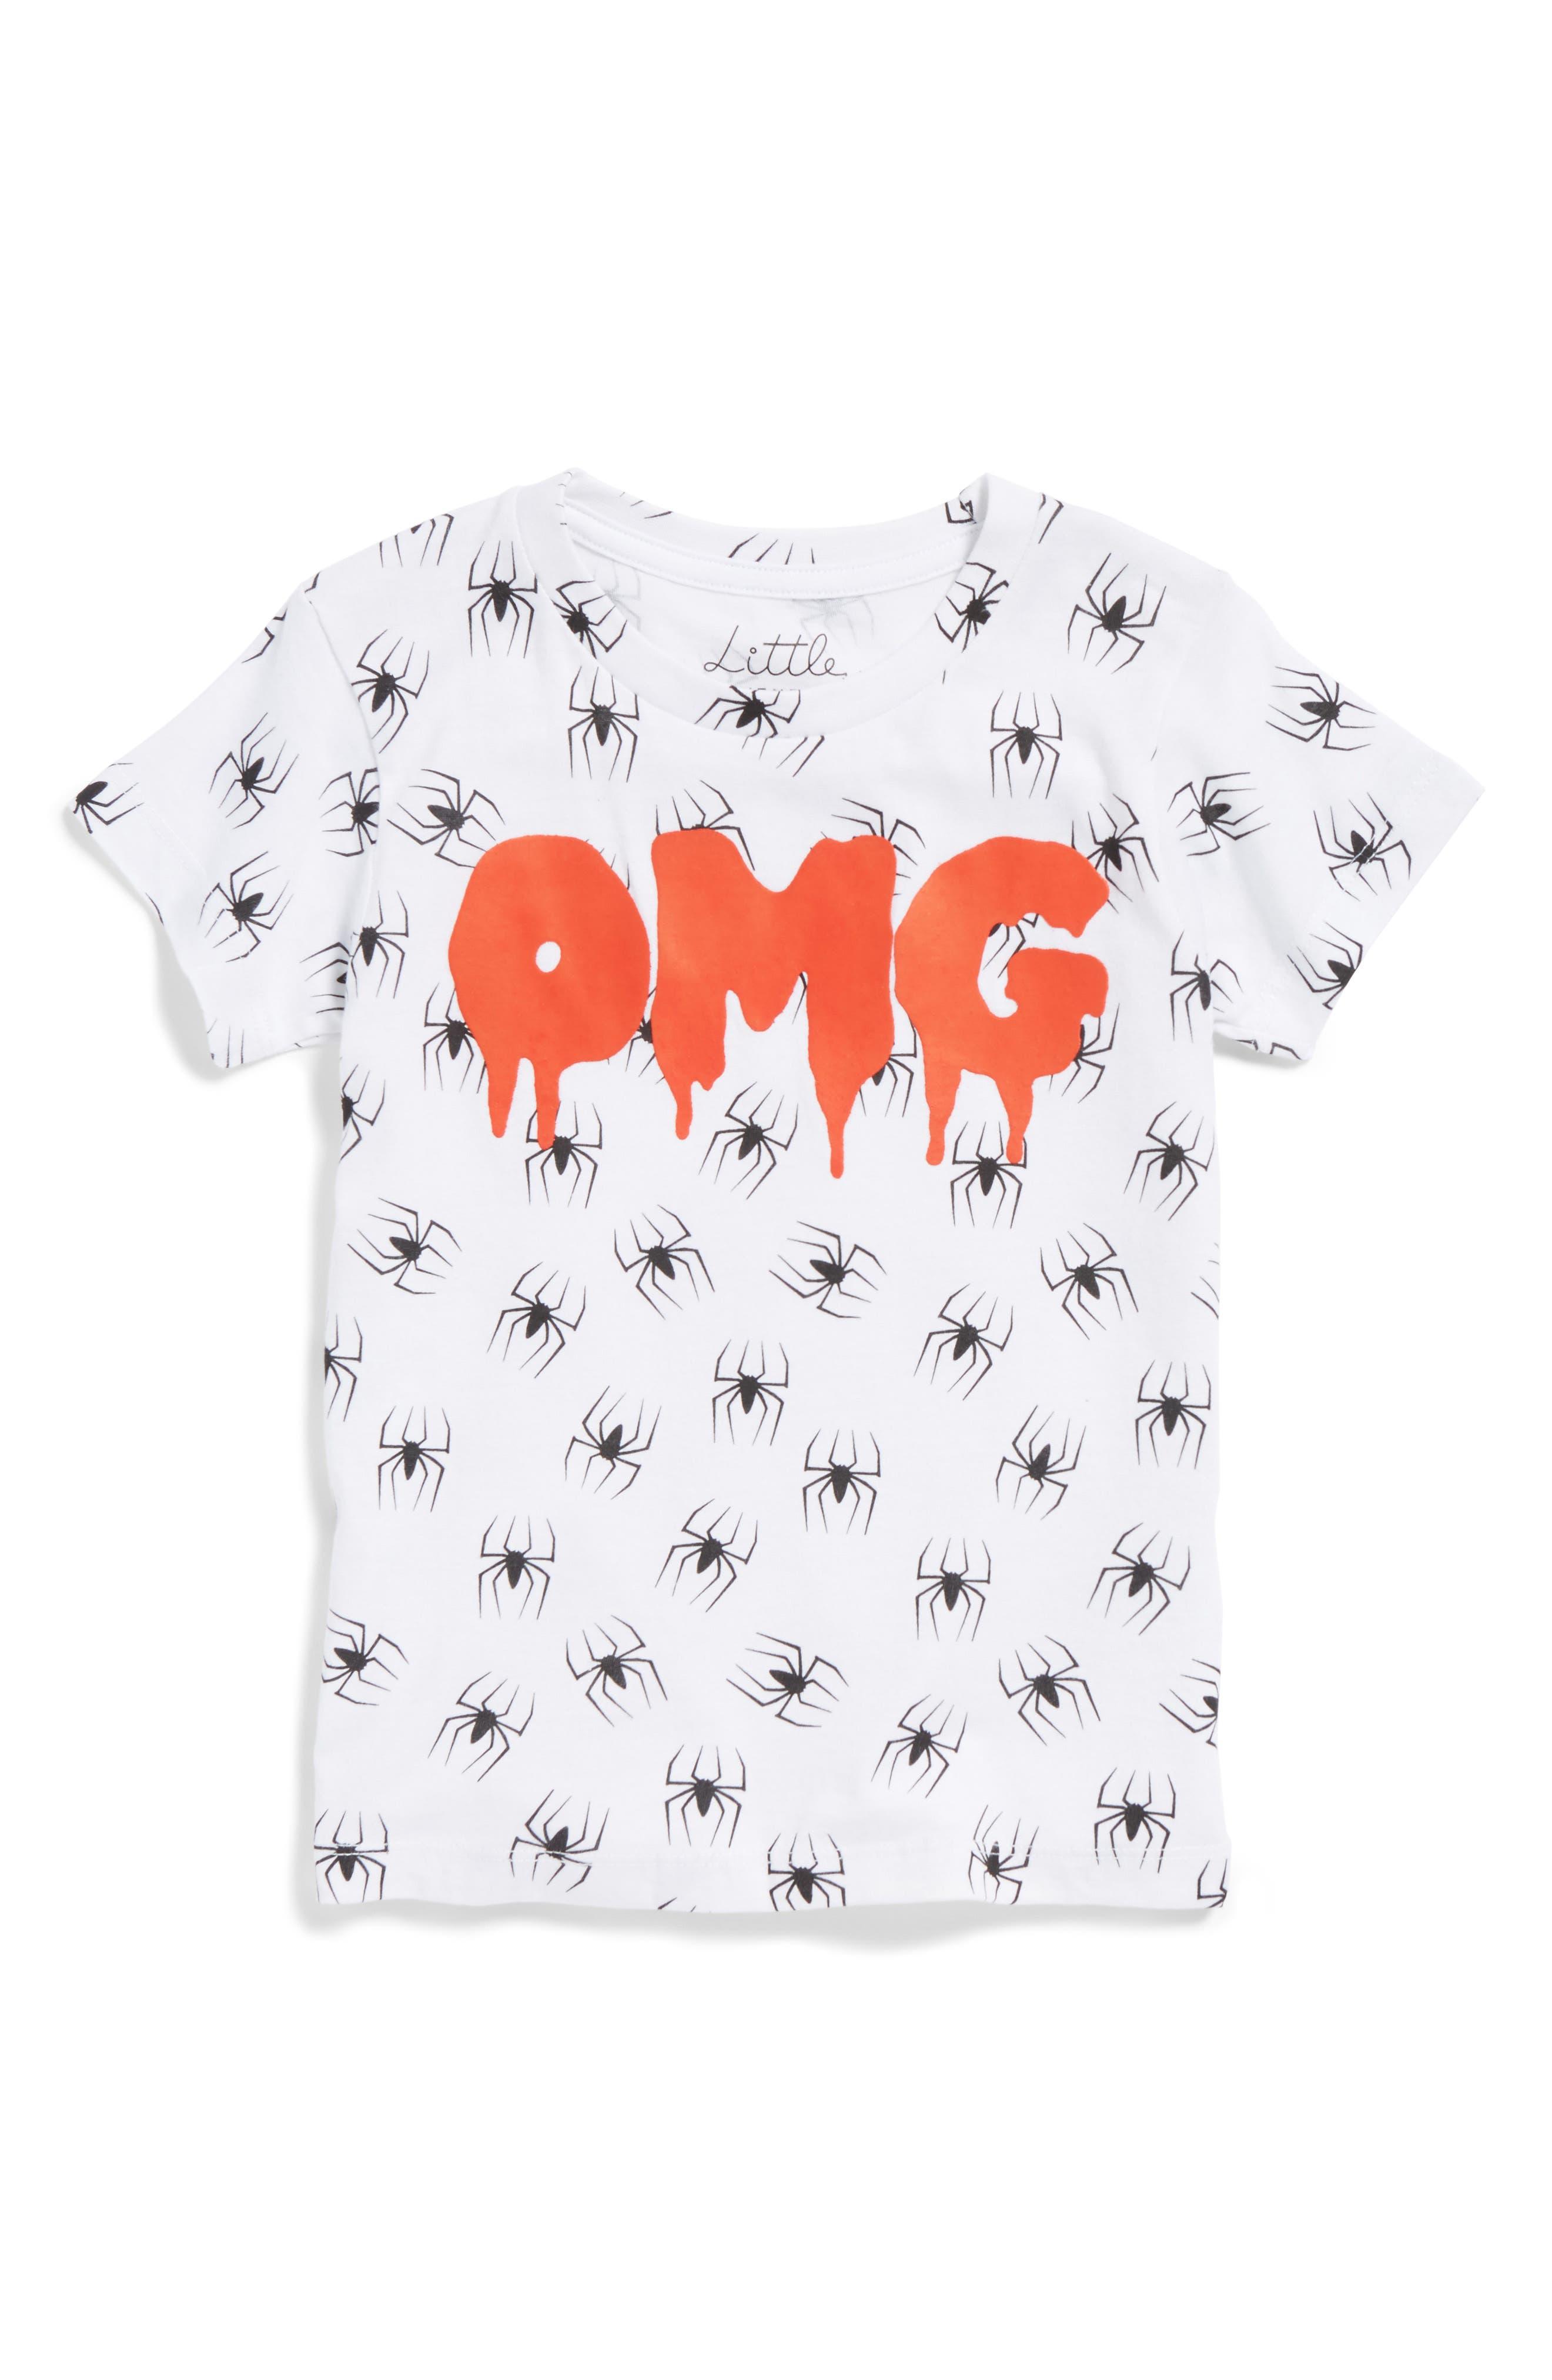 Main Image - Little ELEVENPARIS OMG Spider Graphic T-Shirt (Toddler Boys, Little Boys & Big Boys)